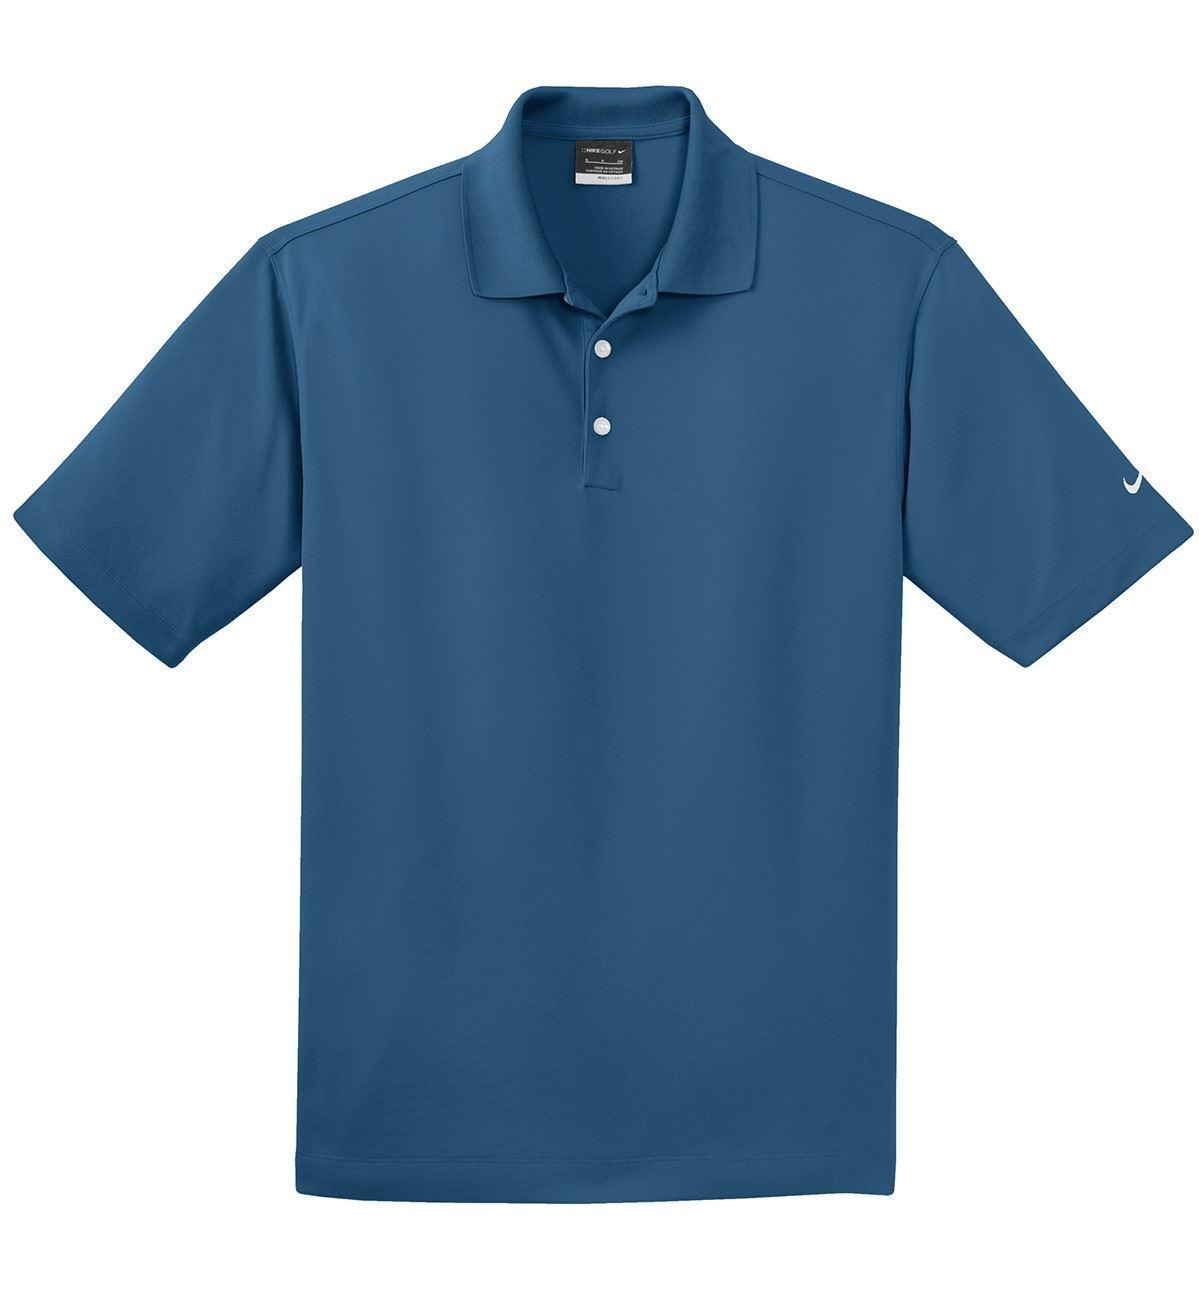 the nike polo golf